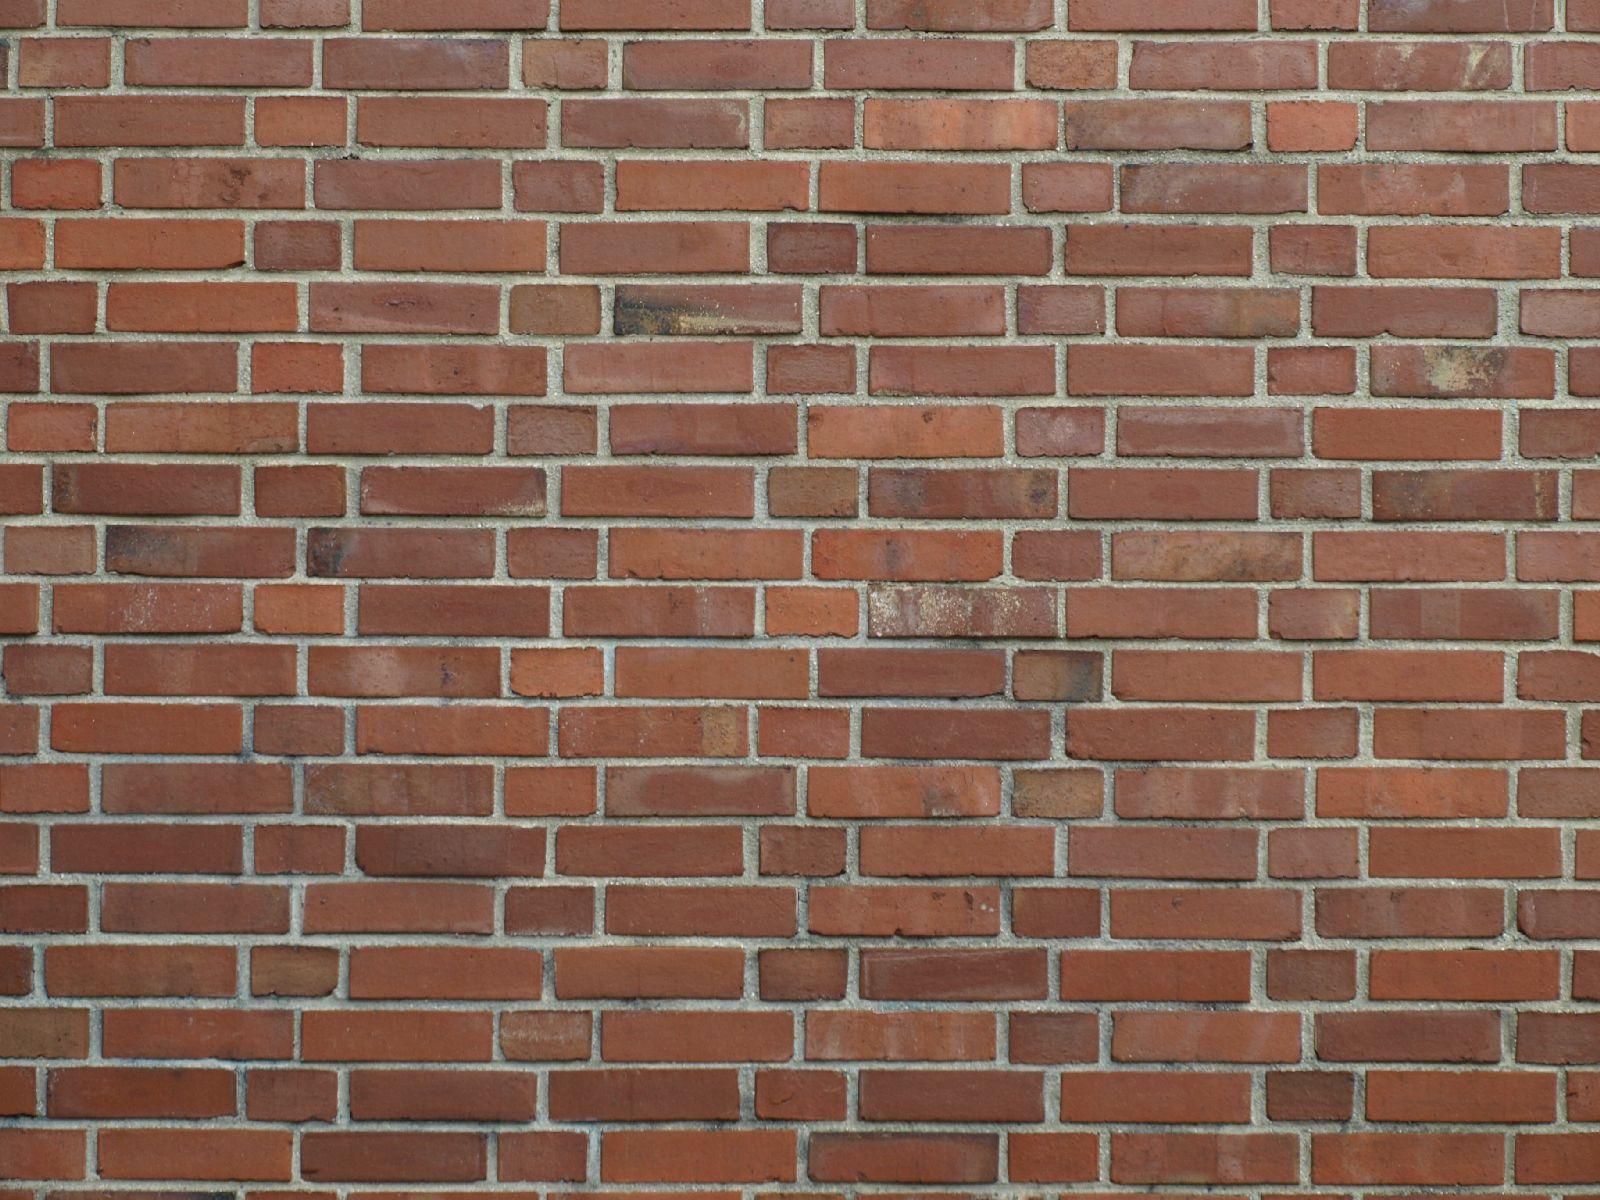 Brick_Texture_A_PA260572